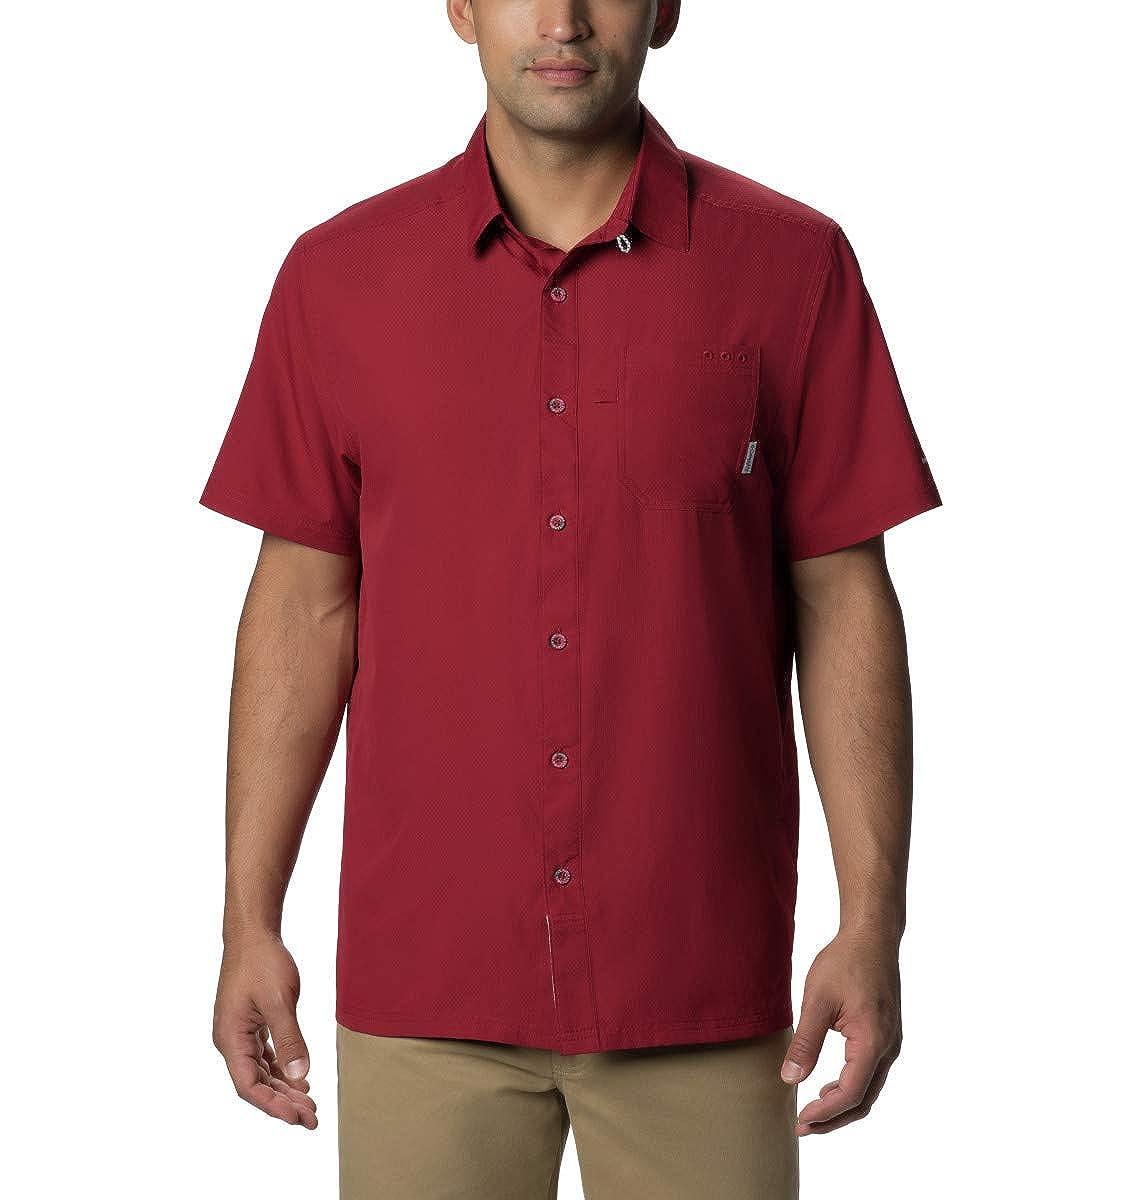 Beet X-Large COLUMBIA Mens Standard Slack Tide Camp Shirt Moisture Wicking